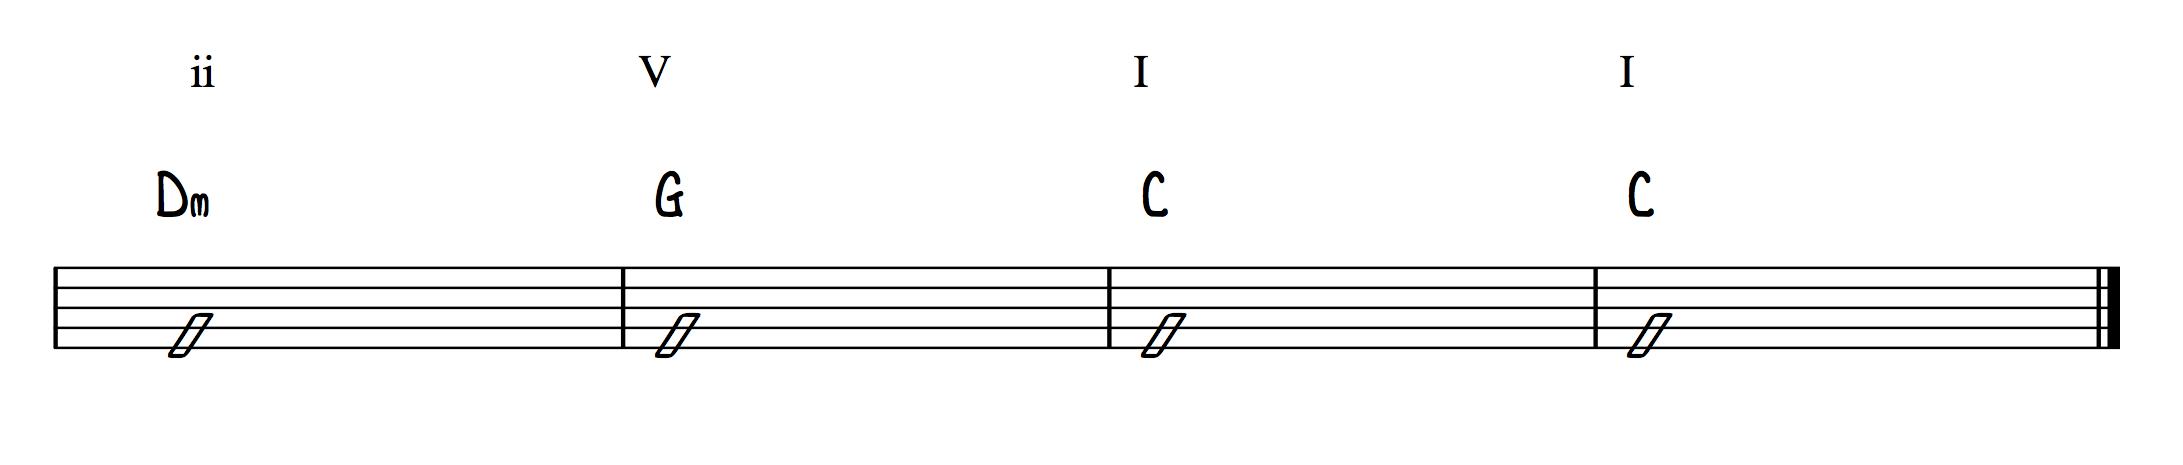 Chord Progression 2 5 1 C